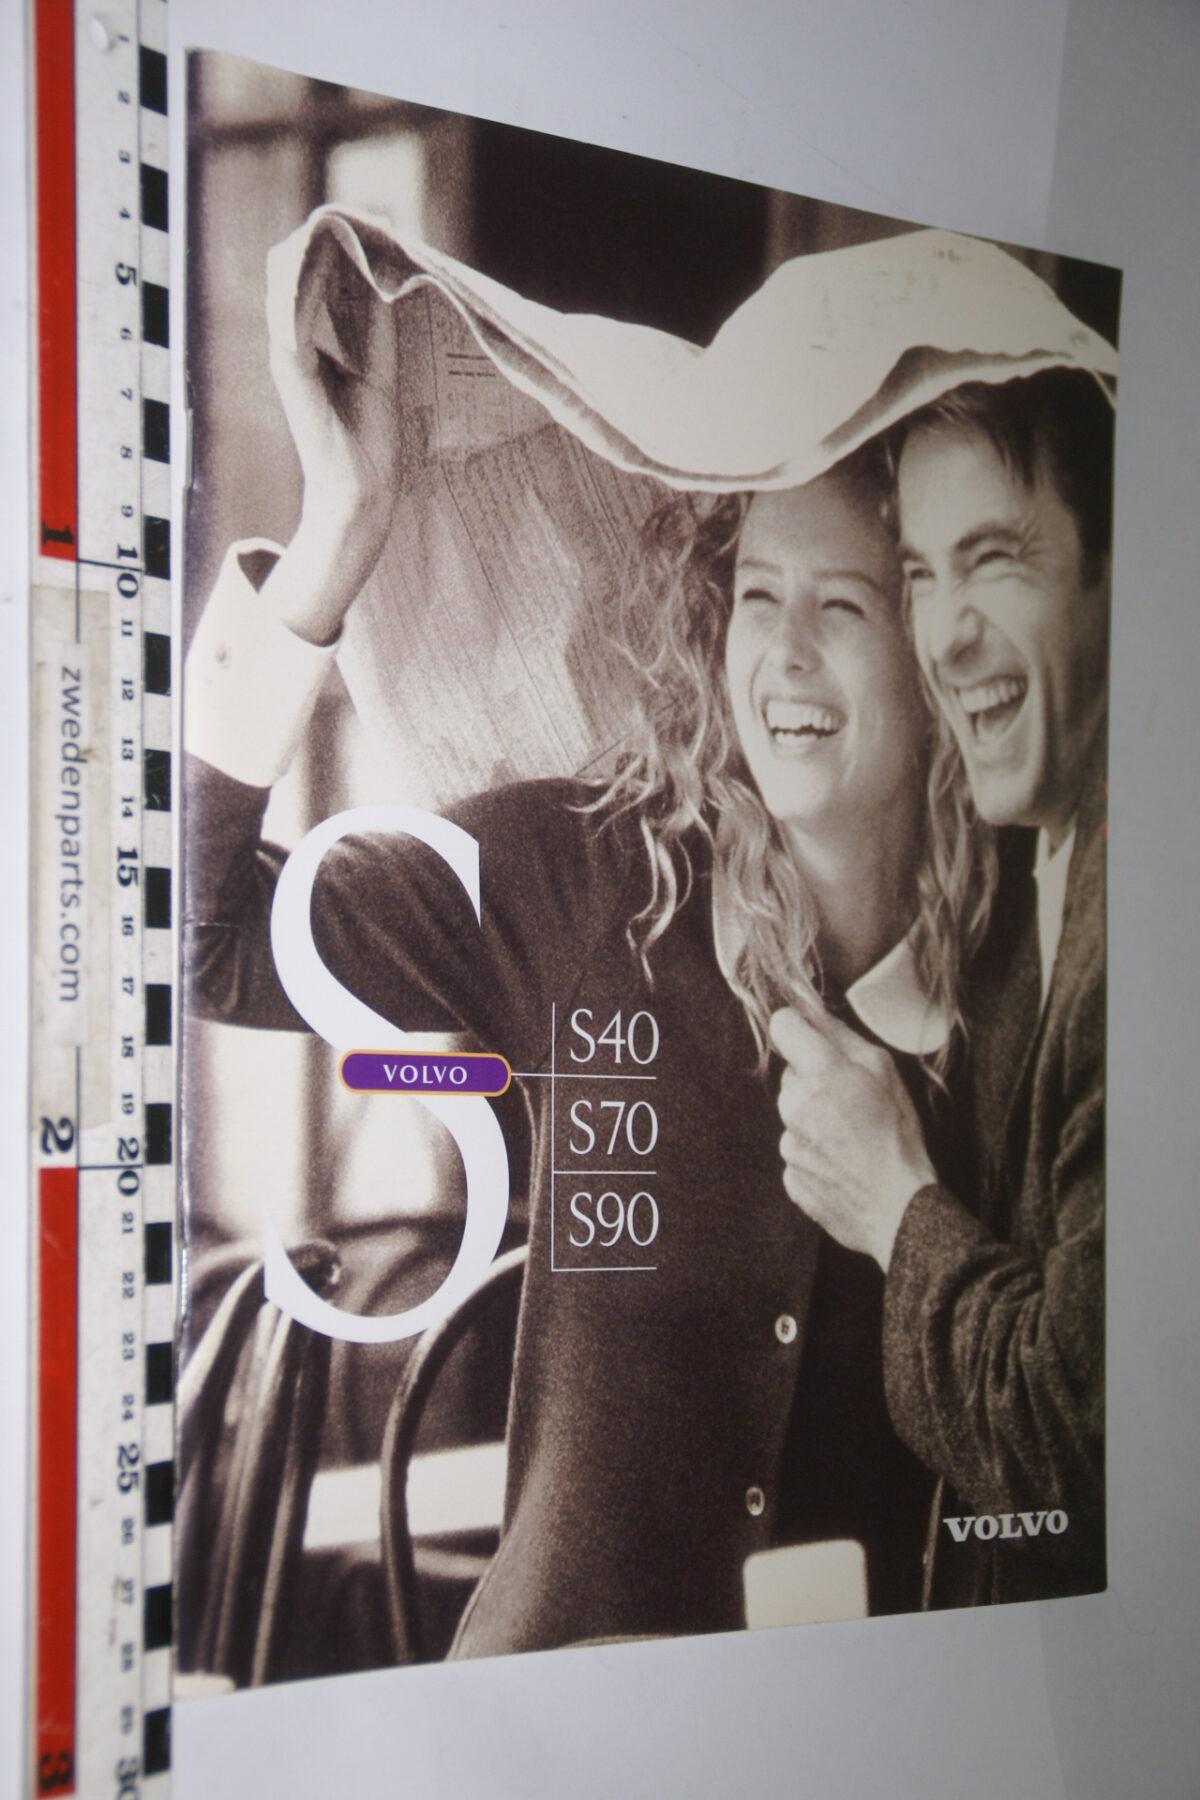 DSC04758 1997 originele brochure Volvo S40 S70 S90 nr A0197-c66abf46